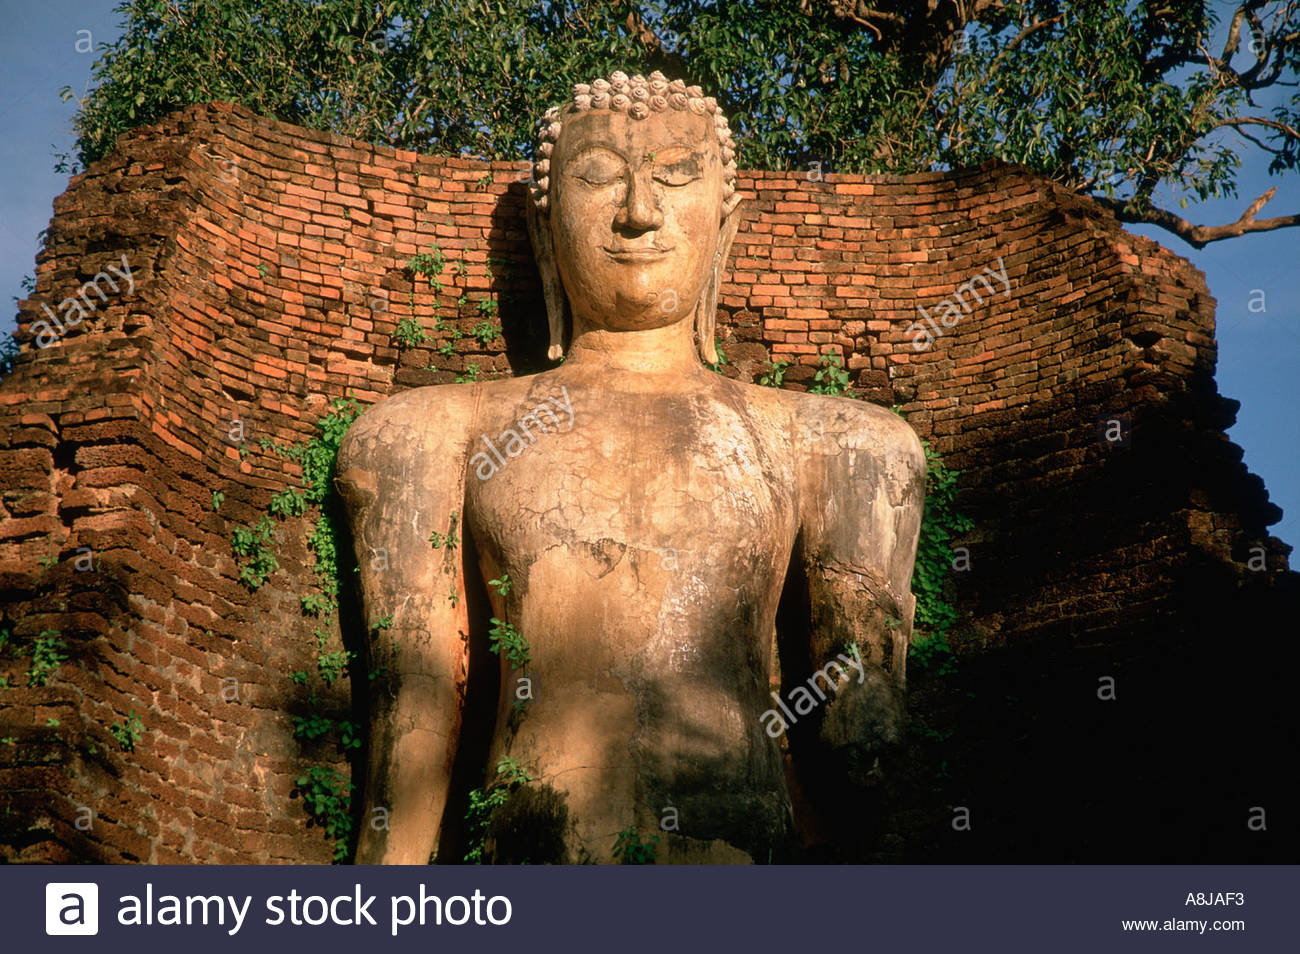 THAILAND, Kamphaeng Phet city, Wat Phra Sit Iriyabot, Sukhothai style, post-classic period. - Stock Image